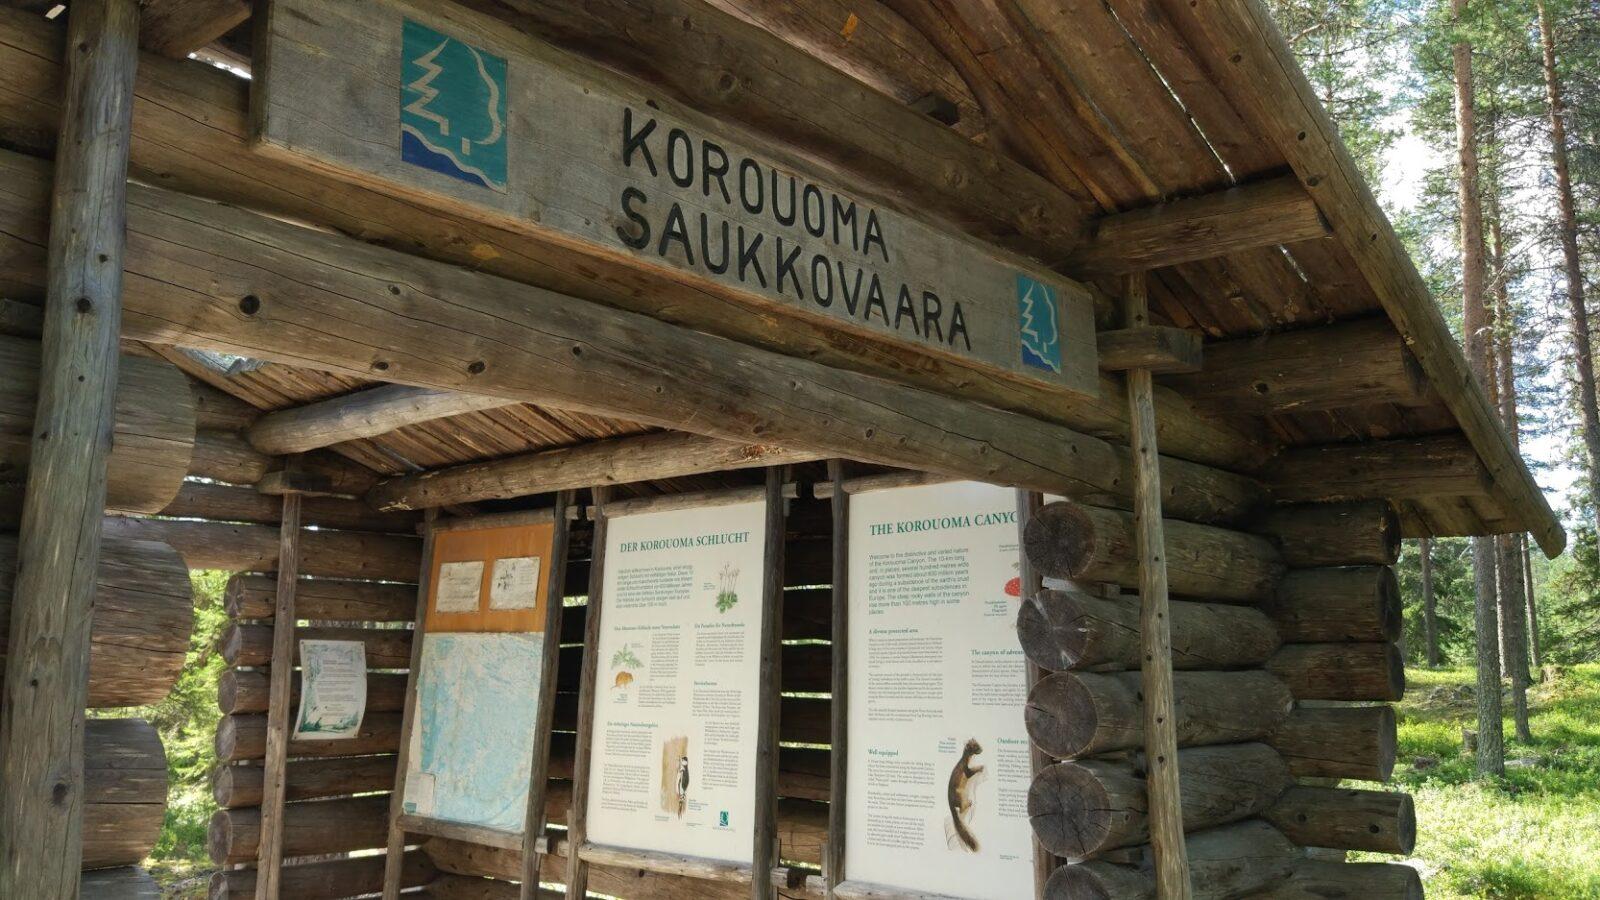 Korouoma National Park